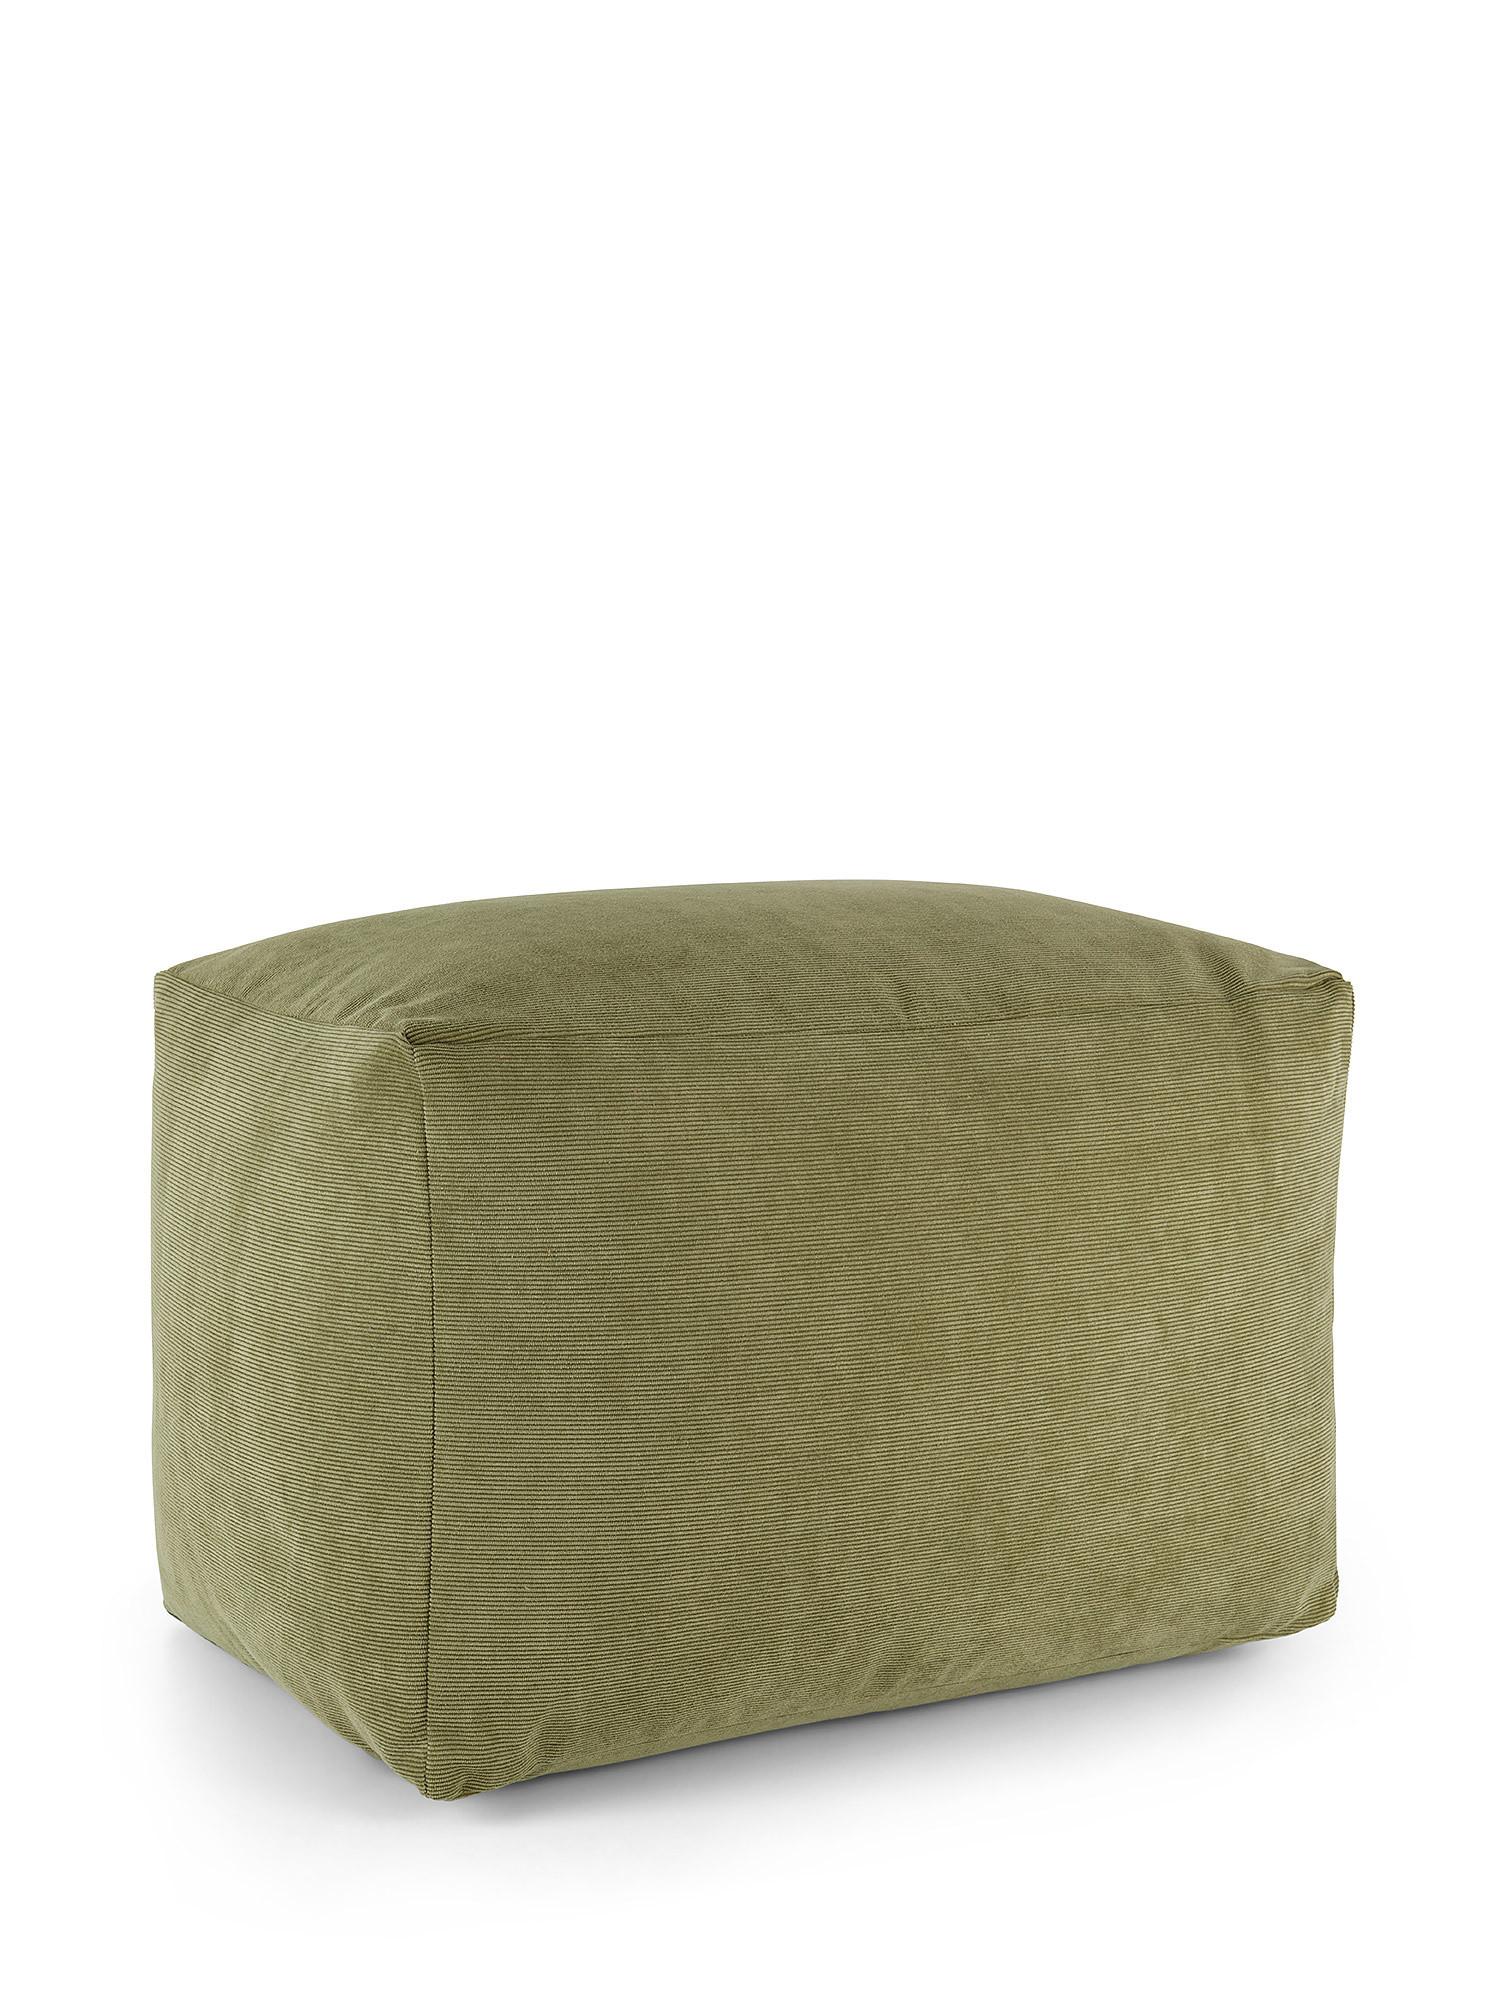 Pouf velluto a costine tinta unita, Verde, large image number 0